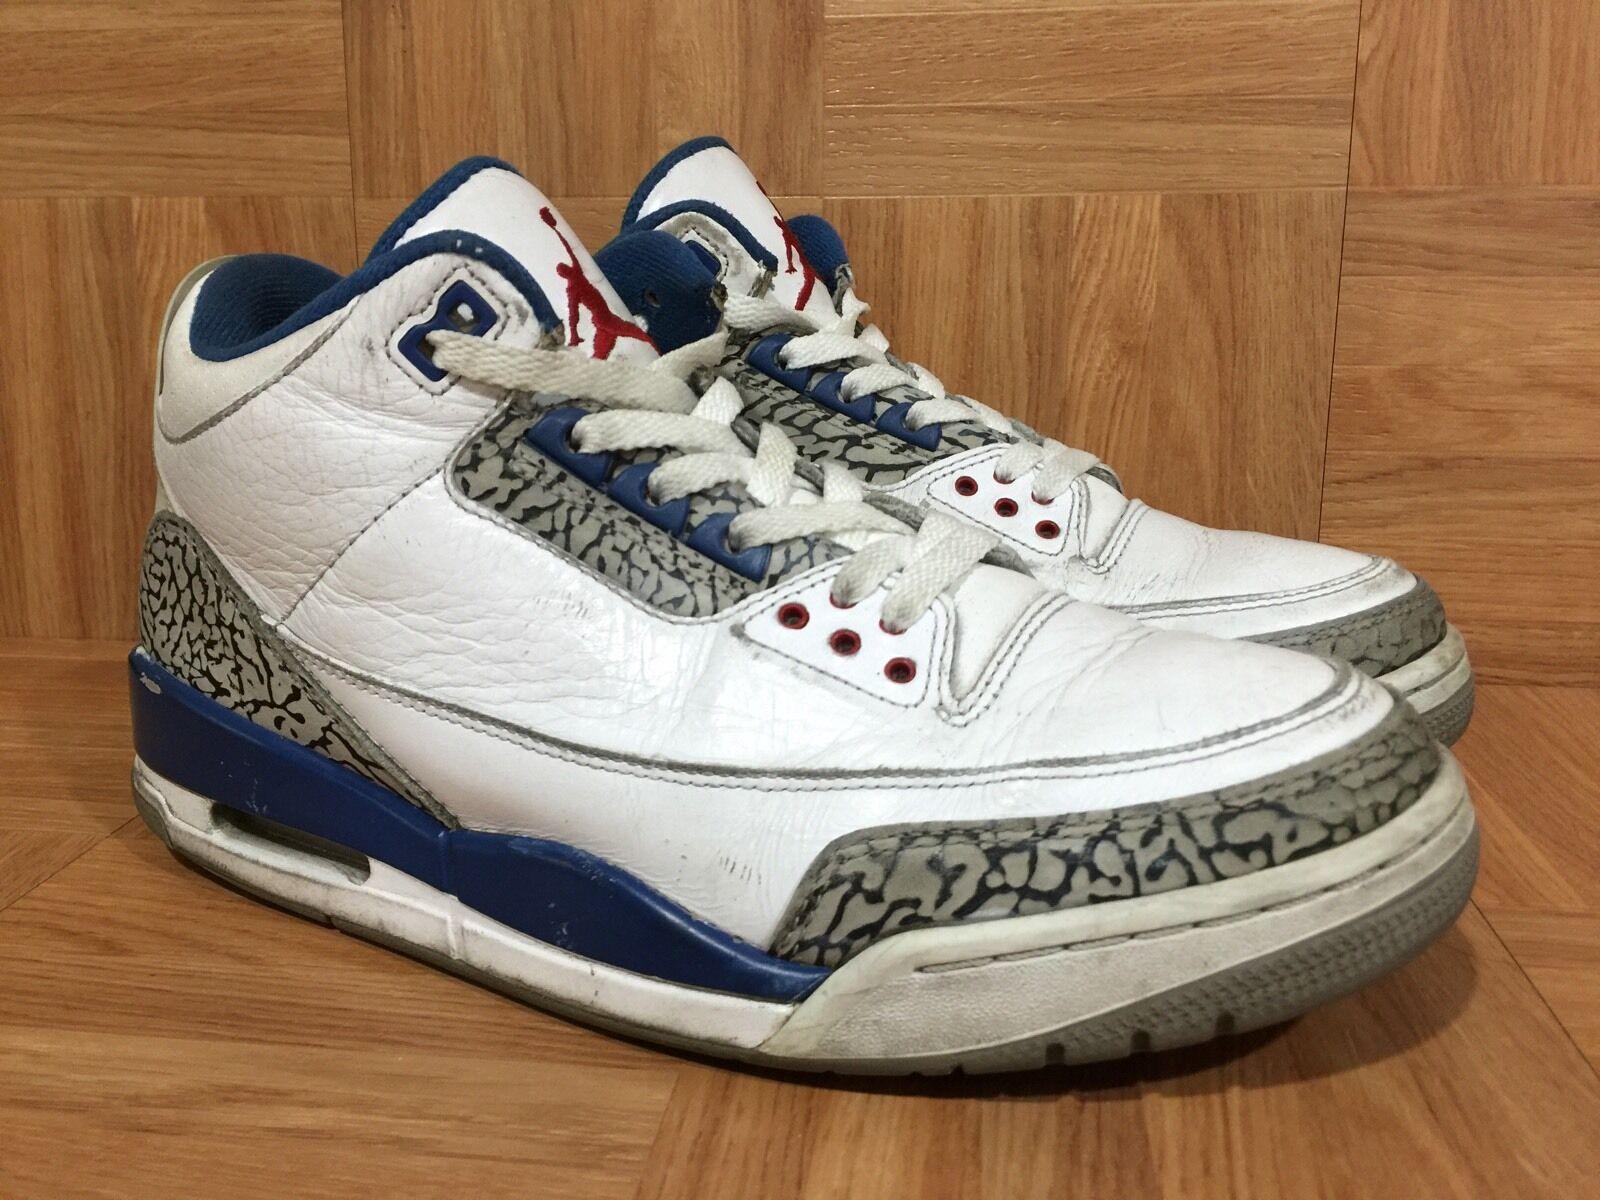 RARE Nike Air Jordan 3 III Retro True Blue White Lthr Cement Gray 9 136064-104